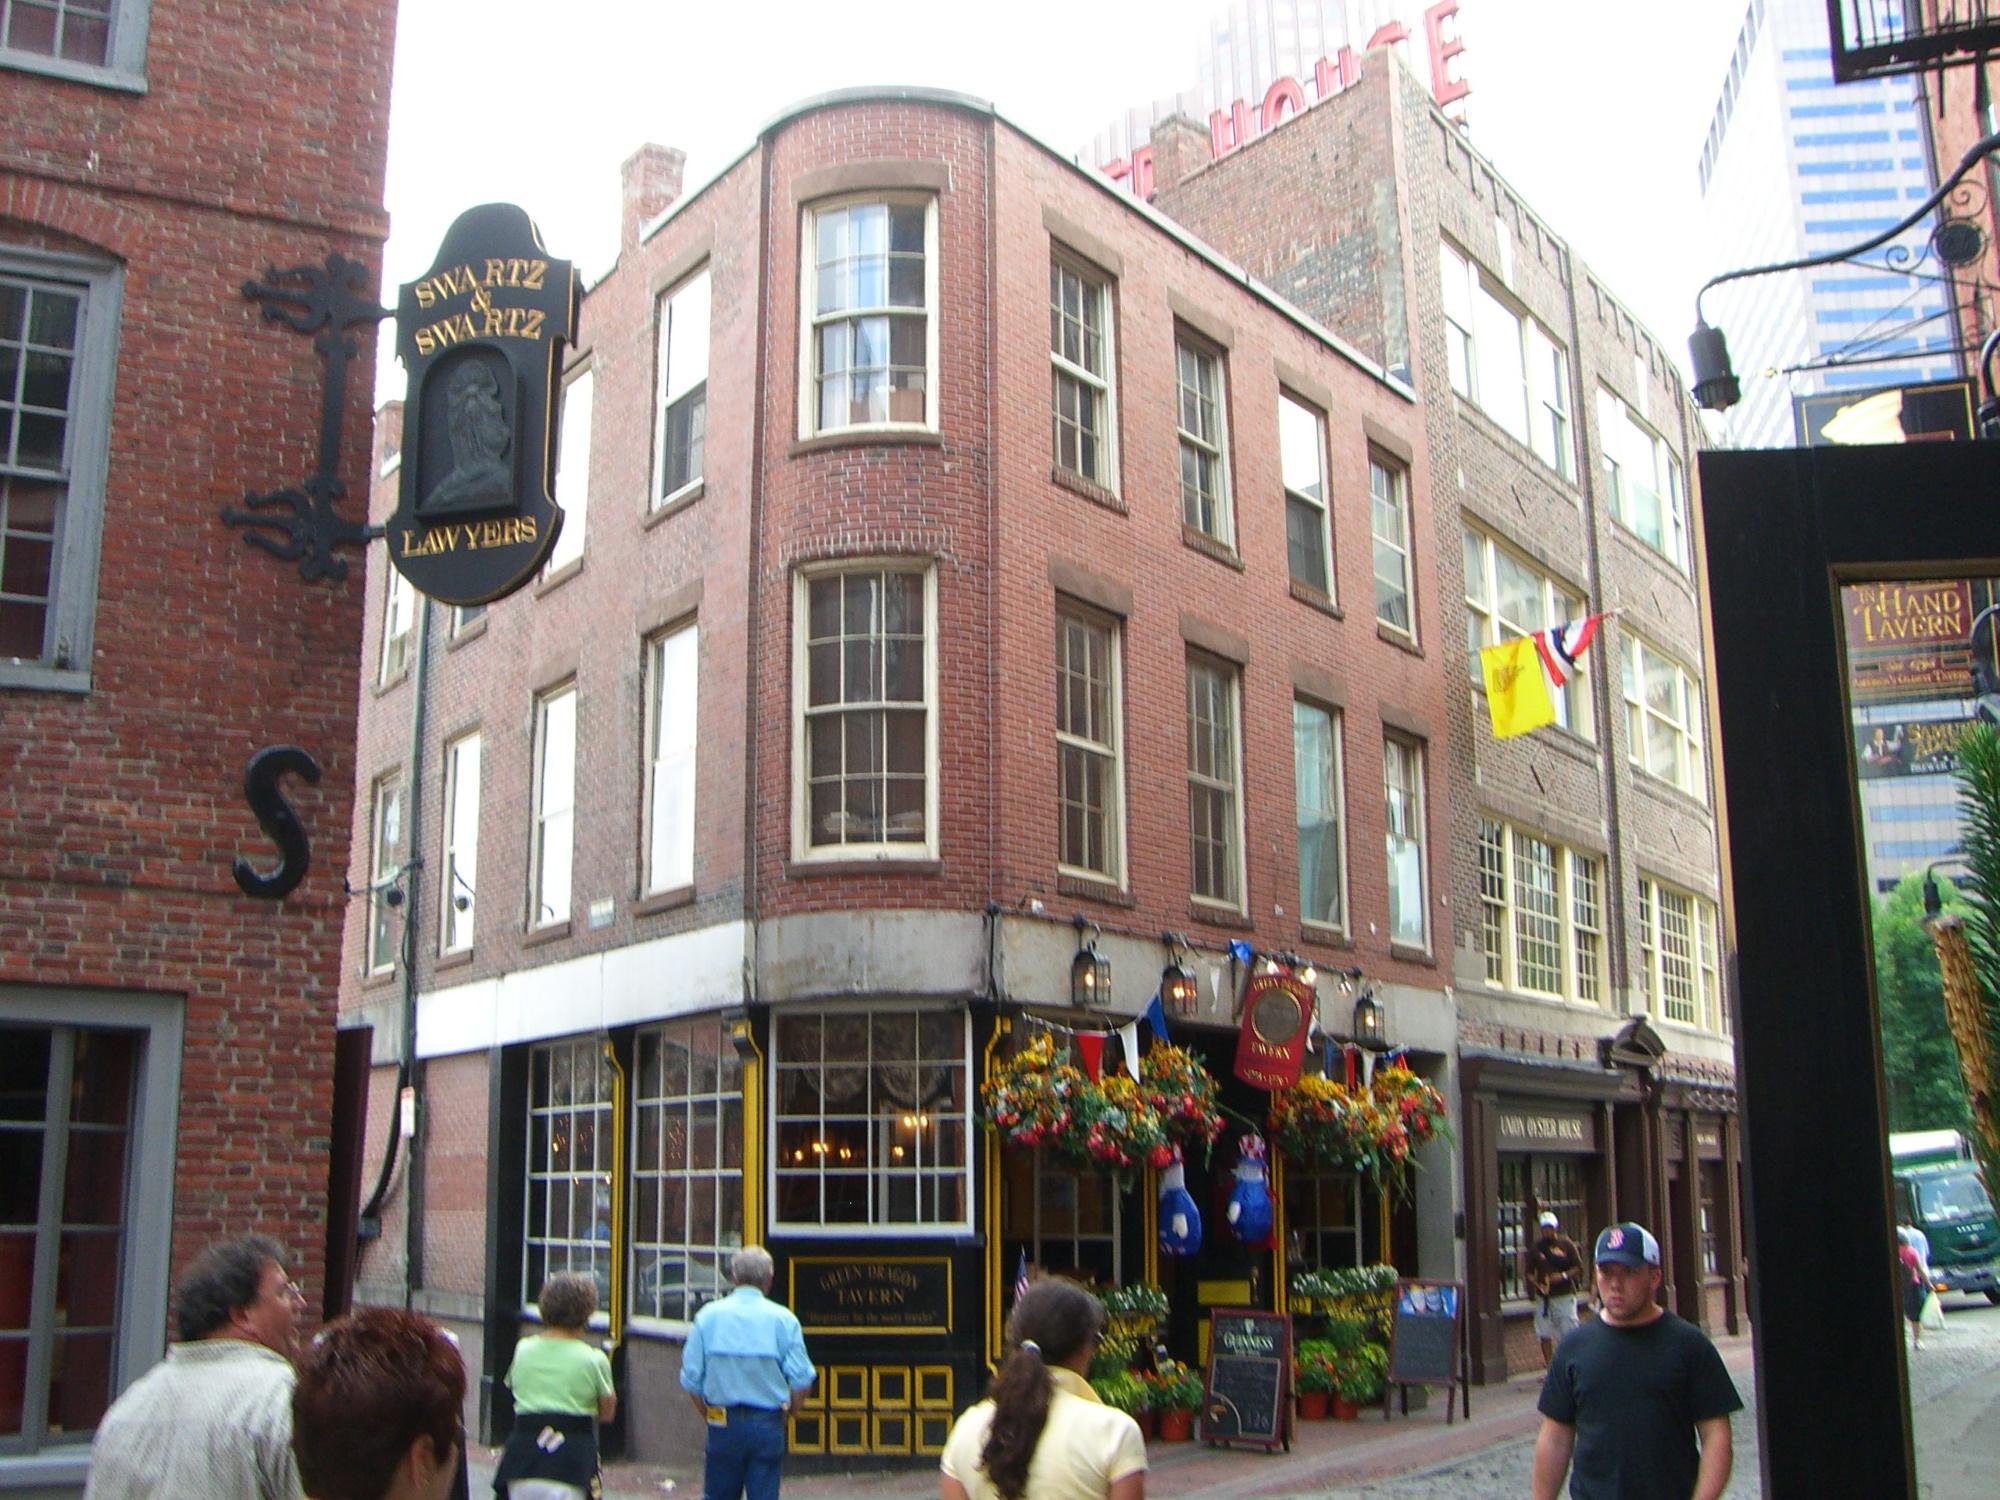 Street corner near Bell In Hand Tavern